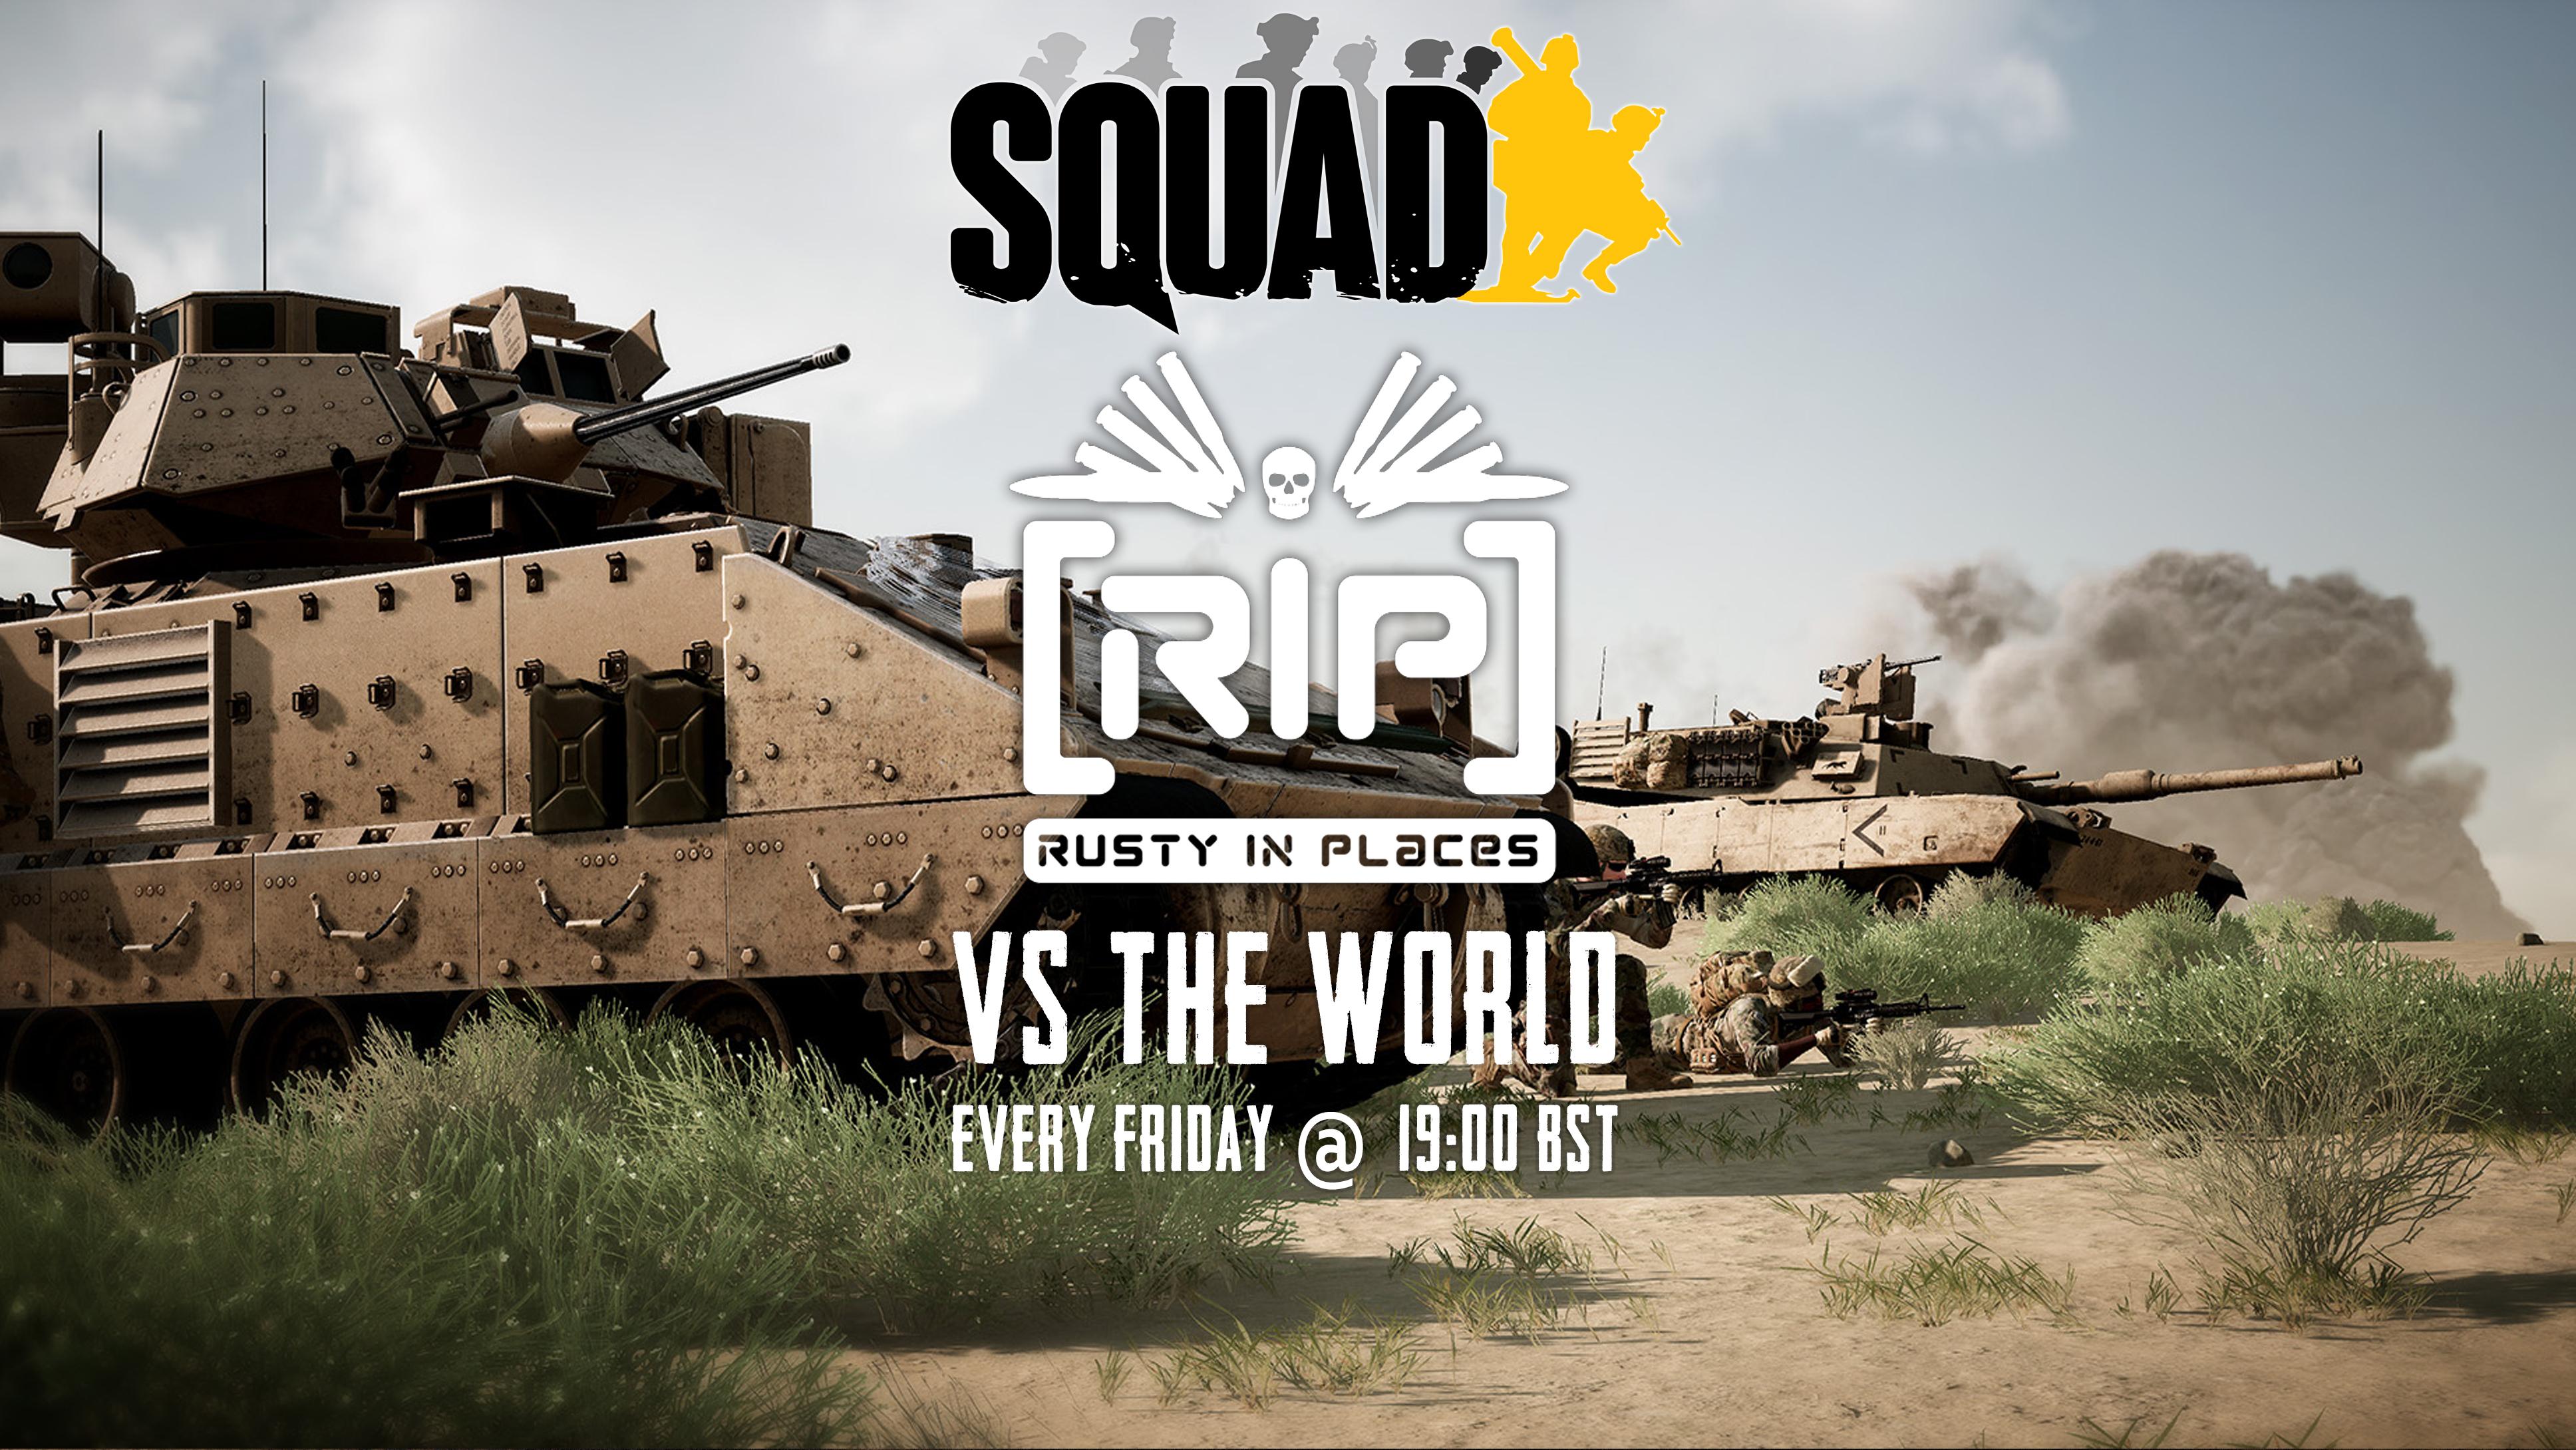 RvW_Squad_bst.jpg